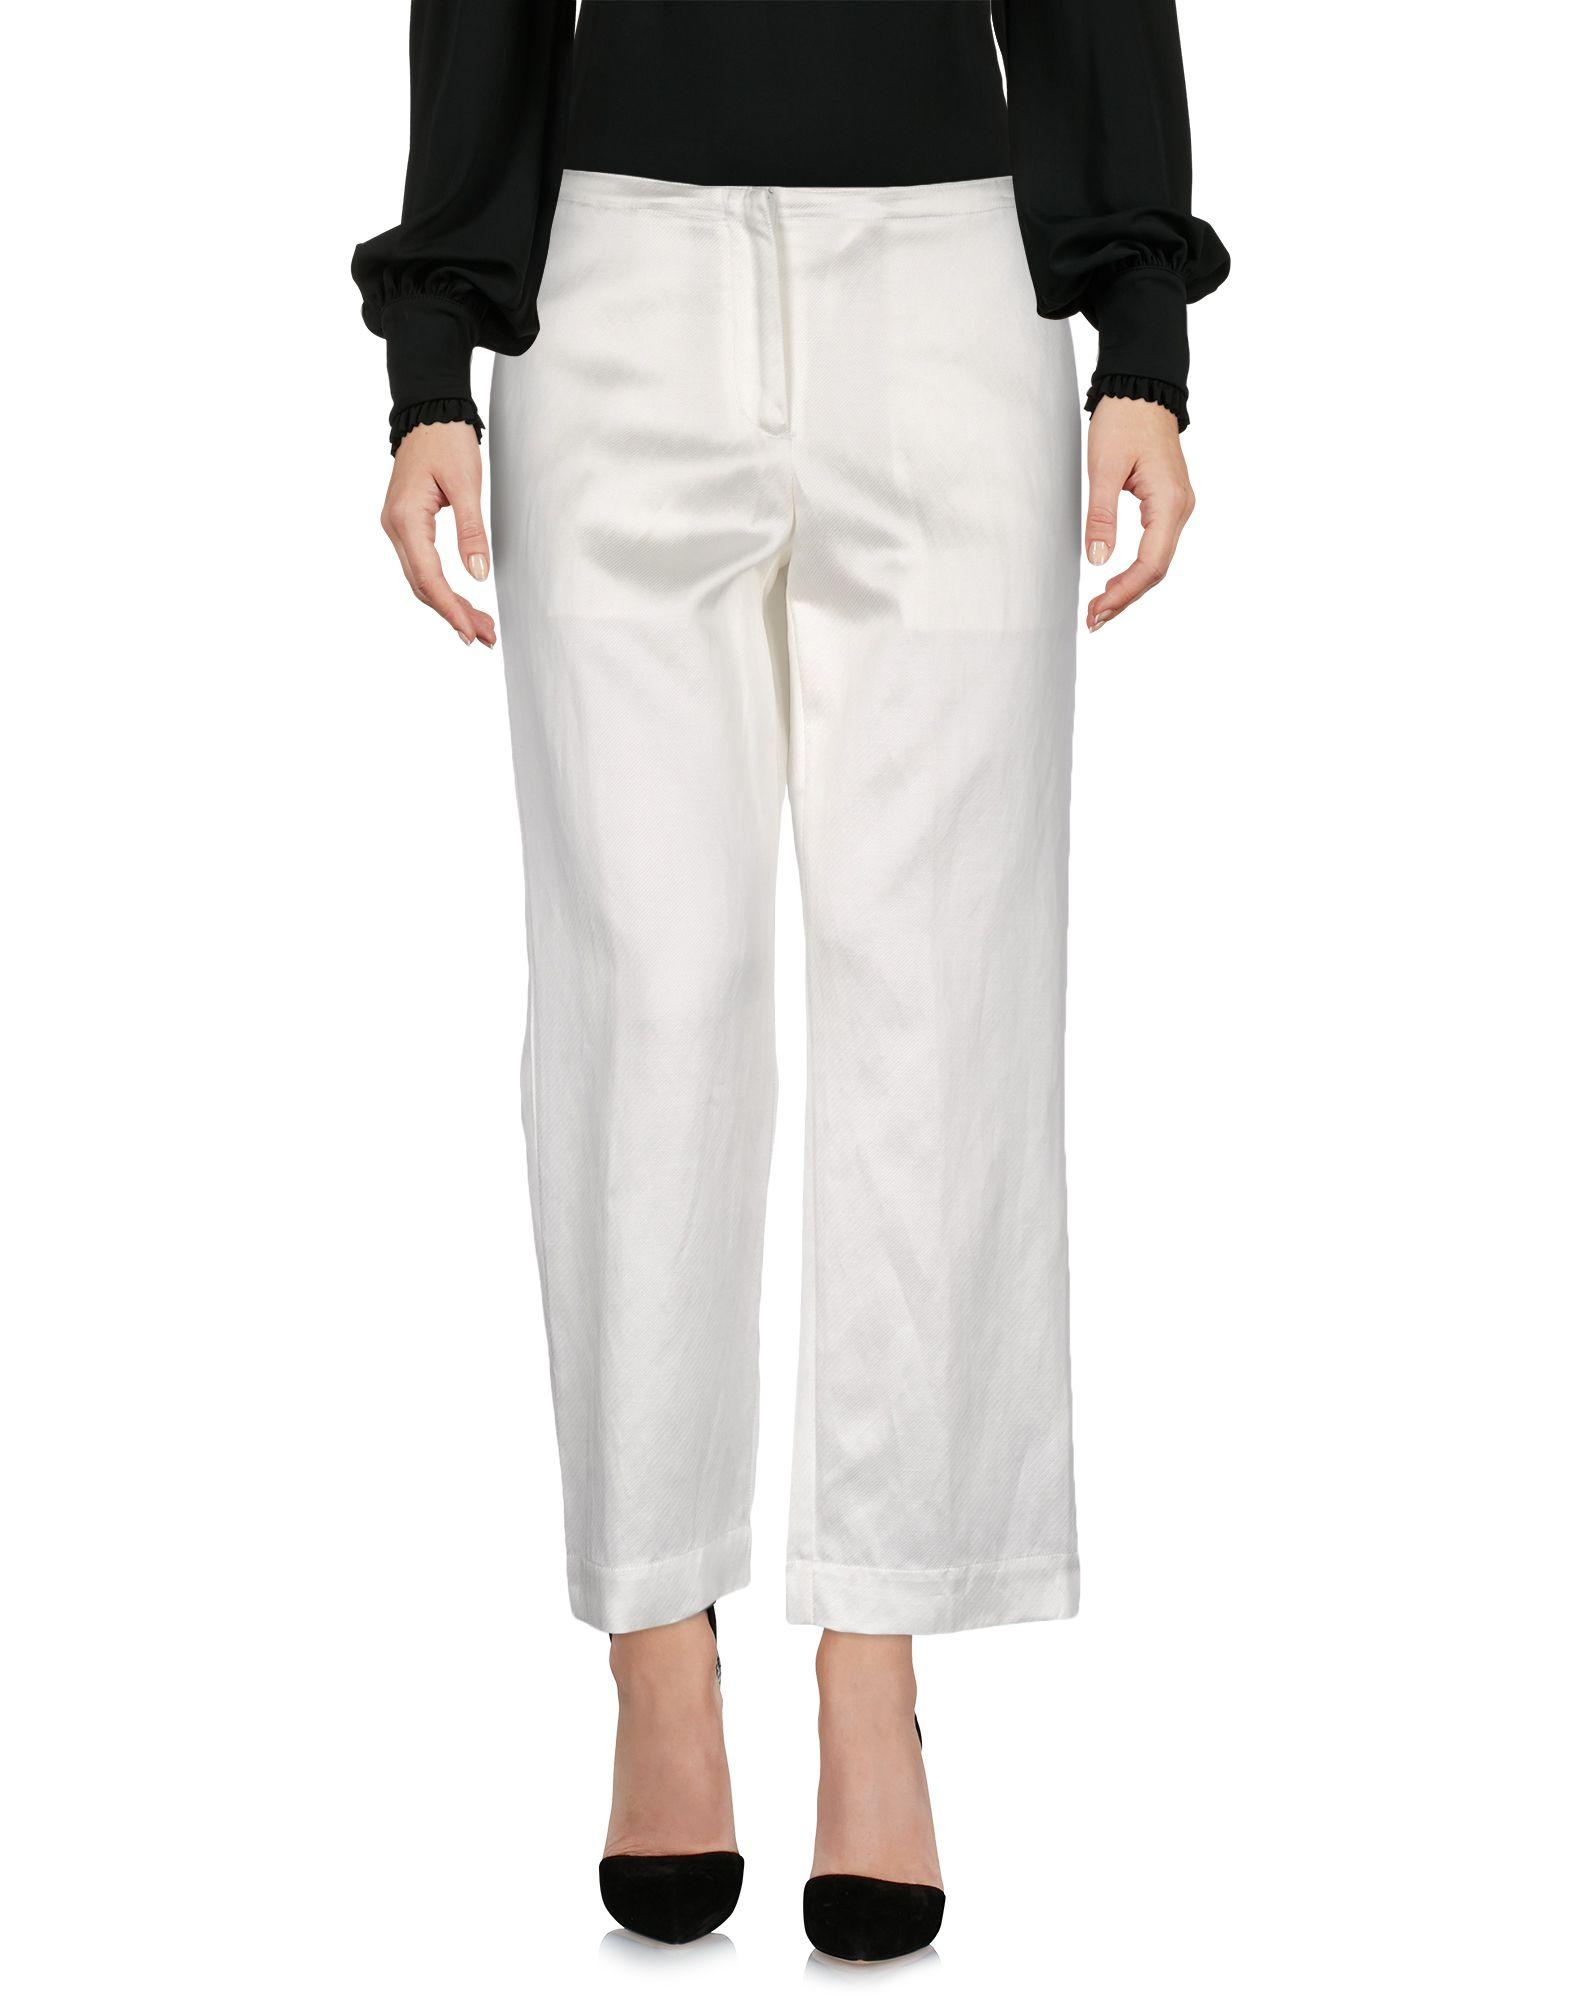 peachoo krejberg короткое платье PEACHOO+KREJBERG Повседневные брюки